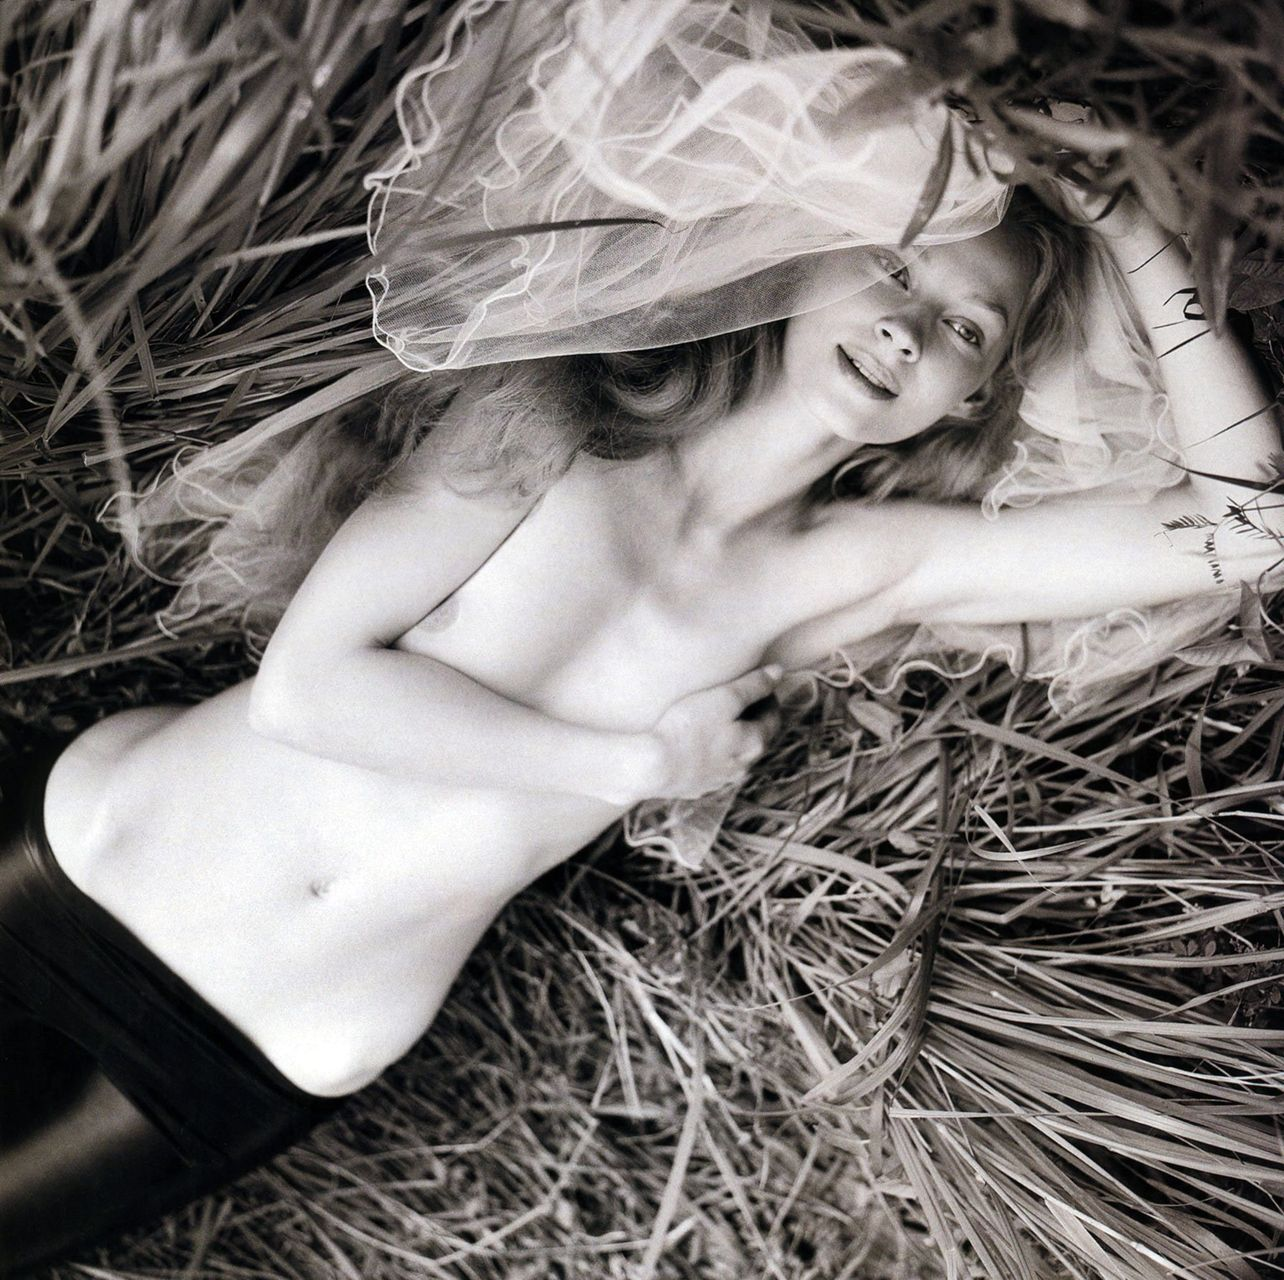 hodchenkova-foto-nyu